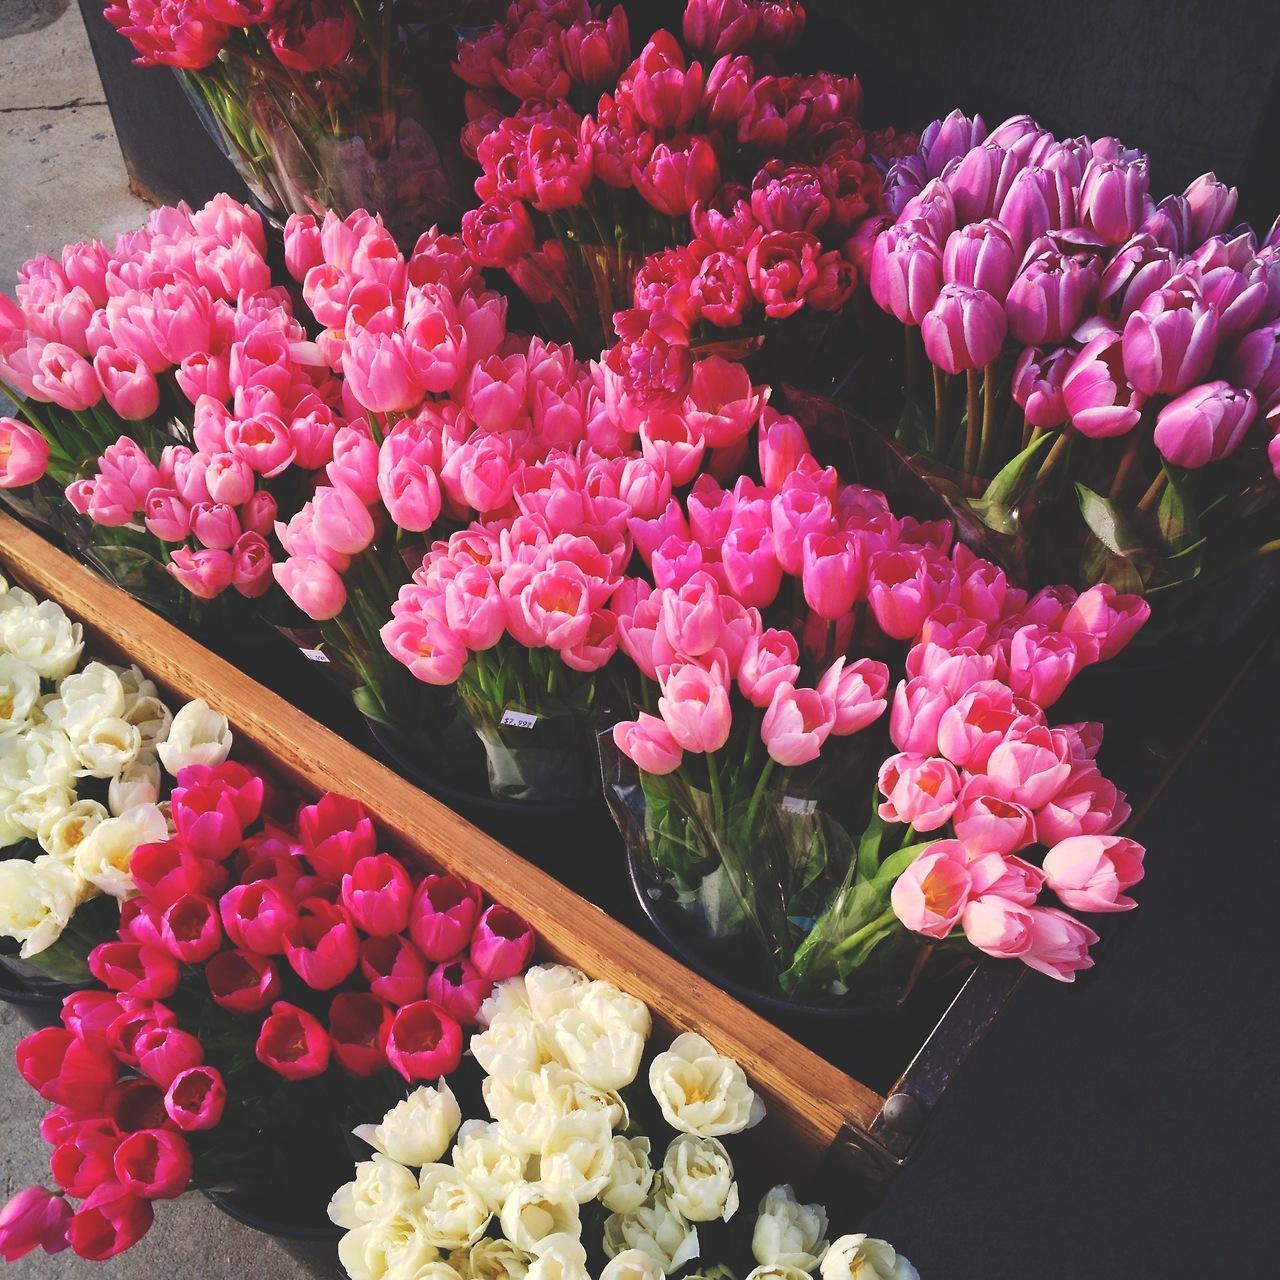 Flowers   via Tumblr shared by @julia_struijk